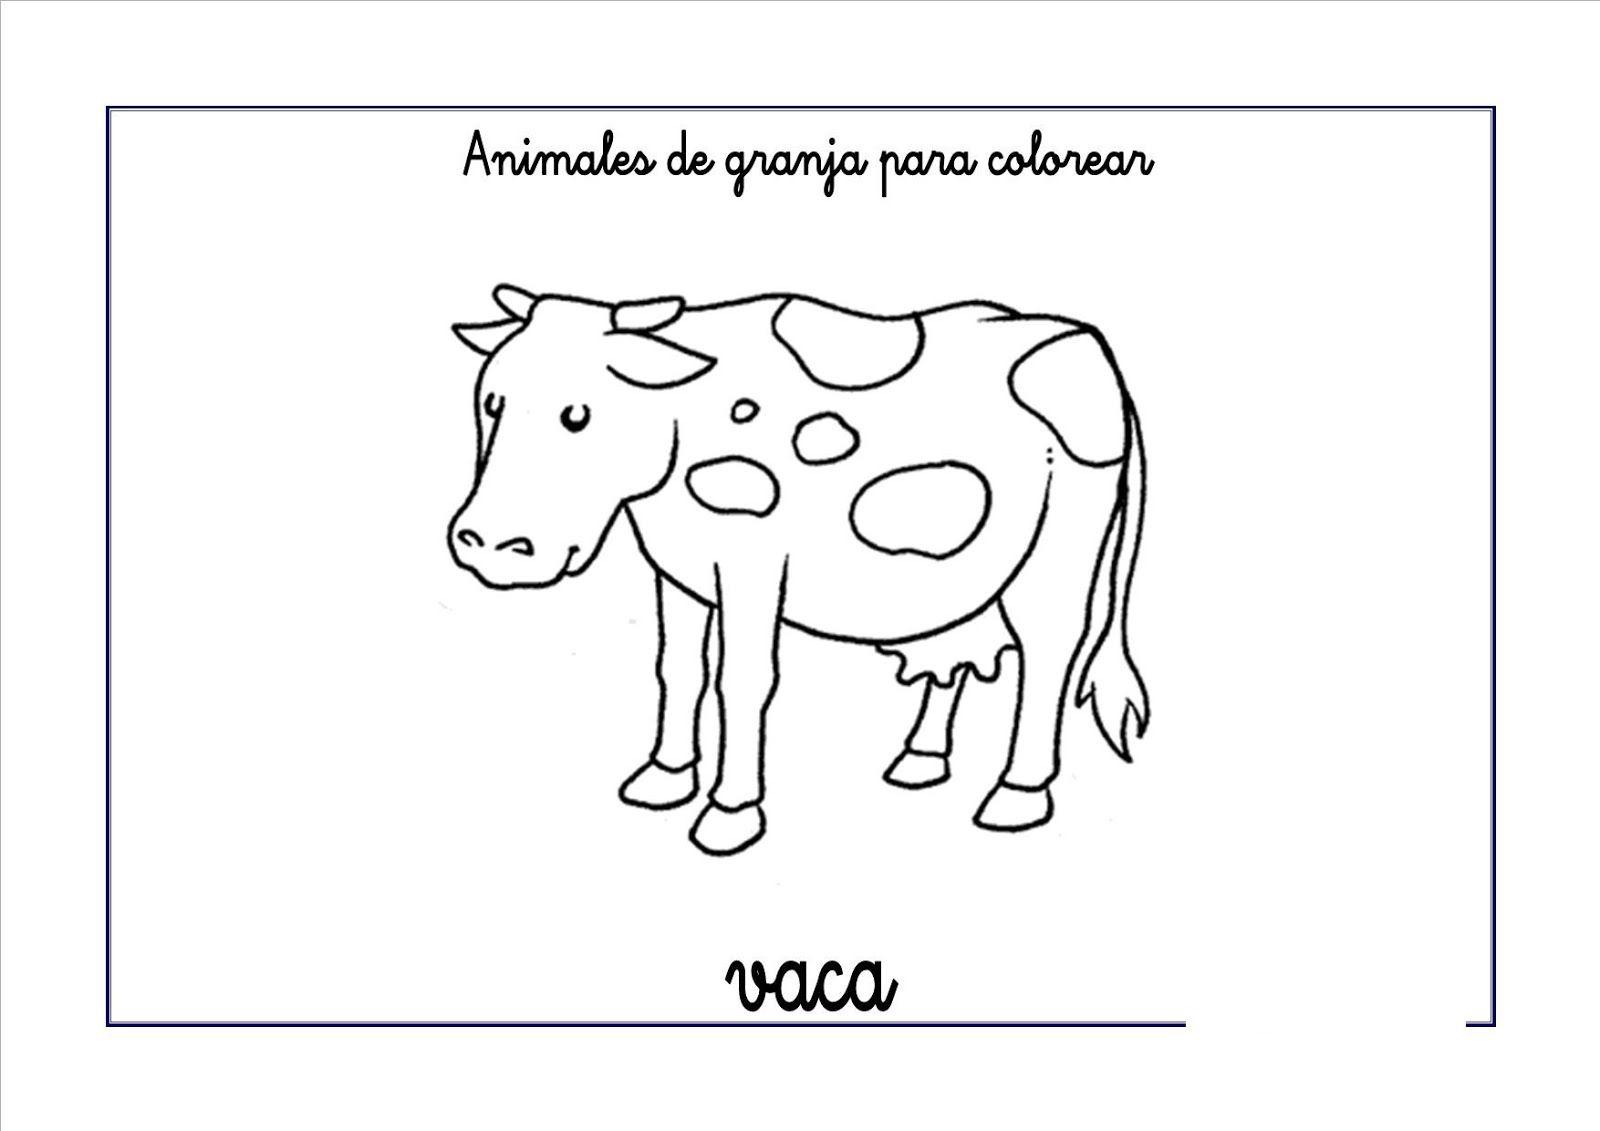 Pin de Ludi Fuertes Garcia en Animales de granja | Pinterest | Vaca ...